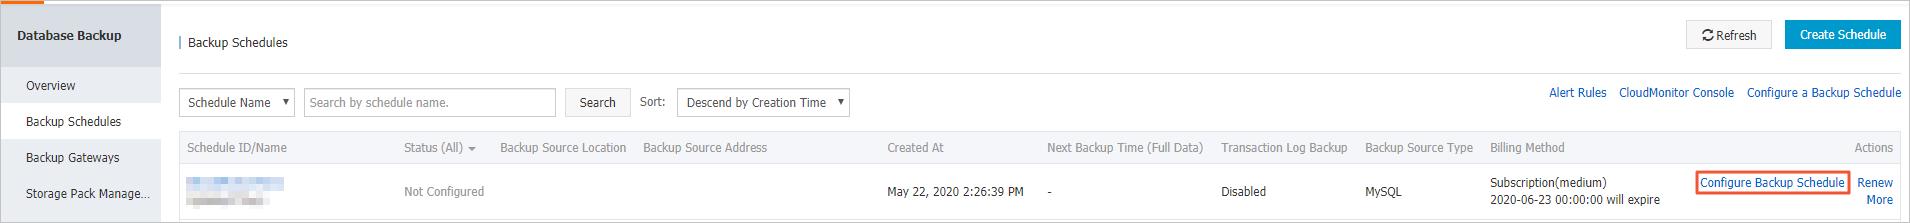 Configure a backup schedule